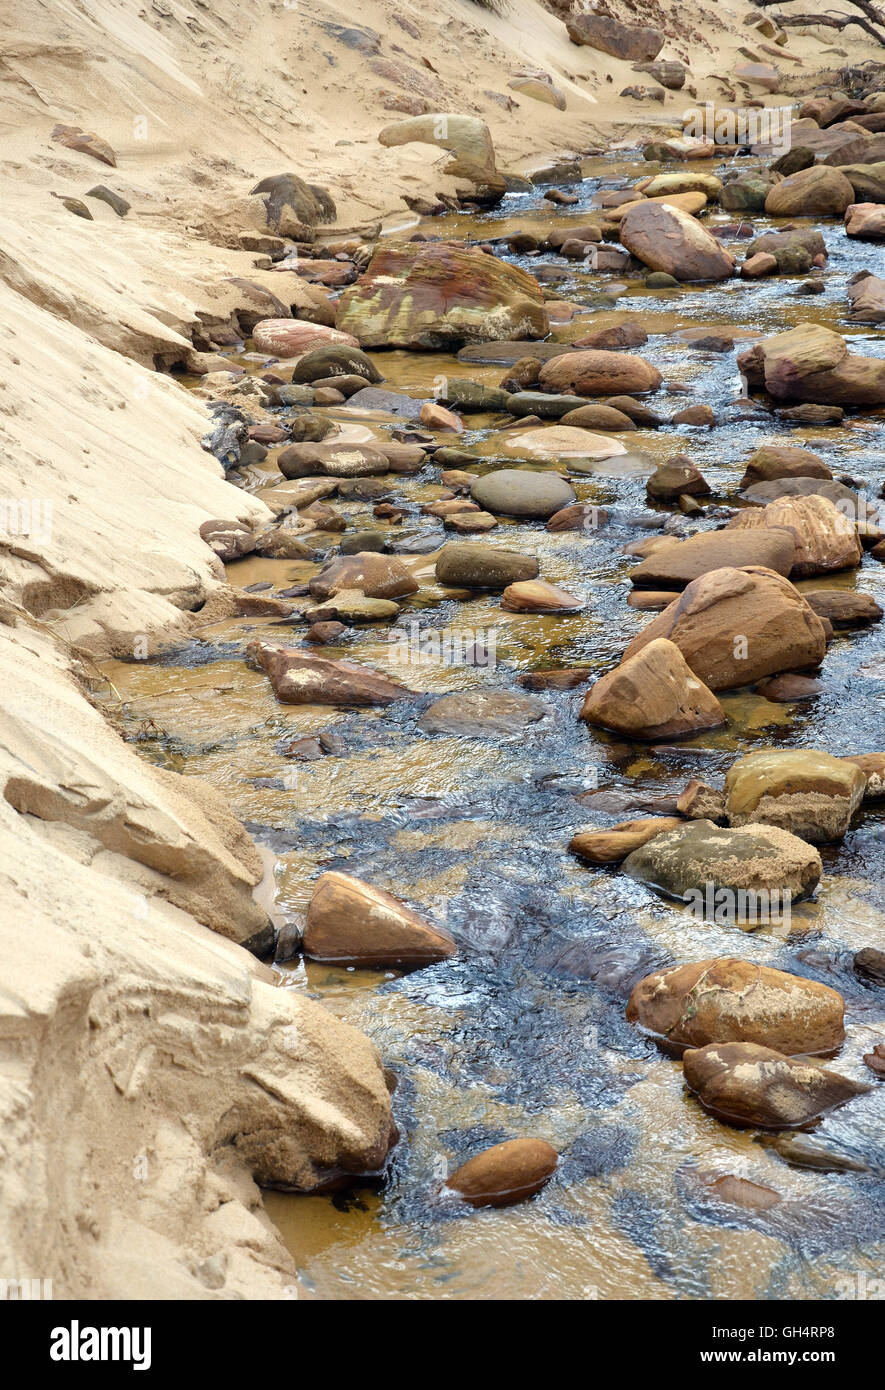 Sandstone boulders in a sandy flowing freshwater creek Stock Photo